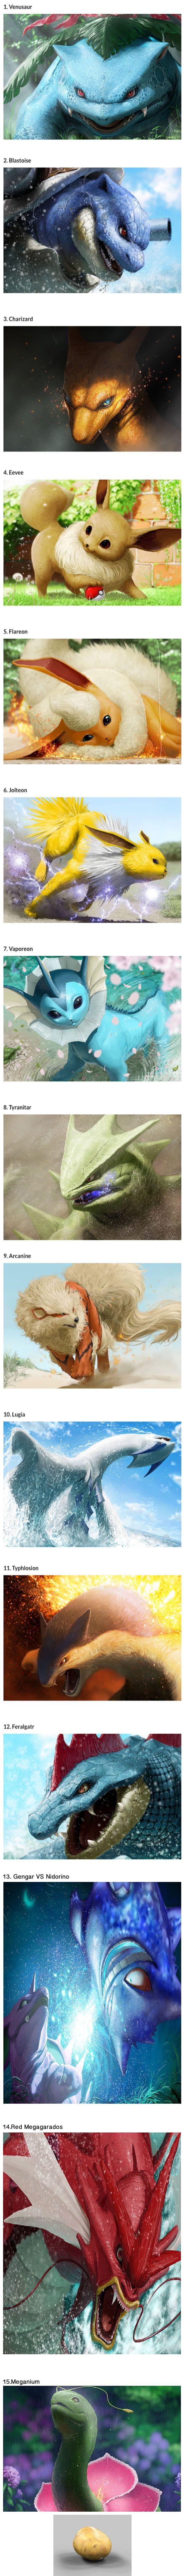 Japanese artist (dekunobou-kizakura) creates breathtaking realistic Pokemon paintings